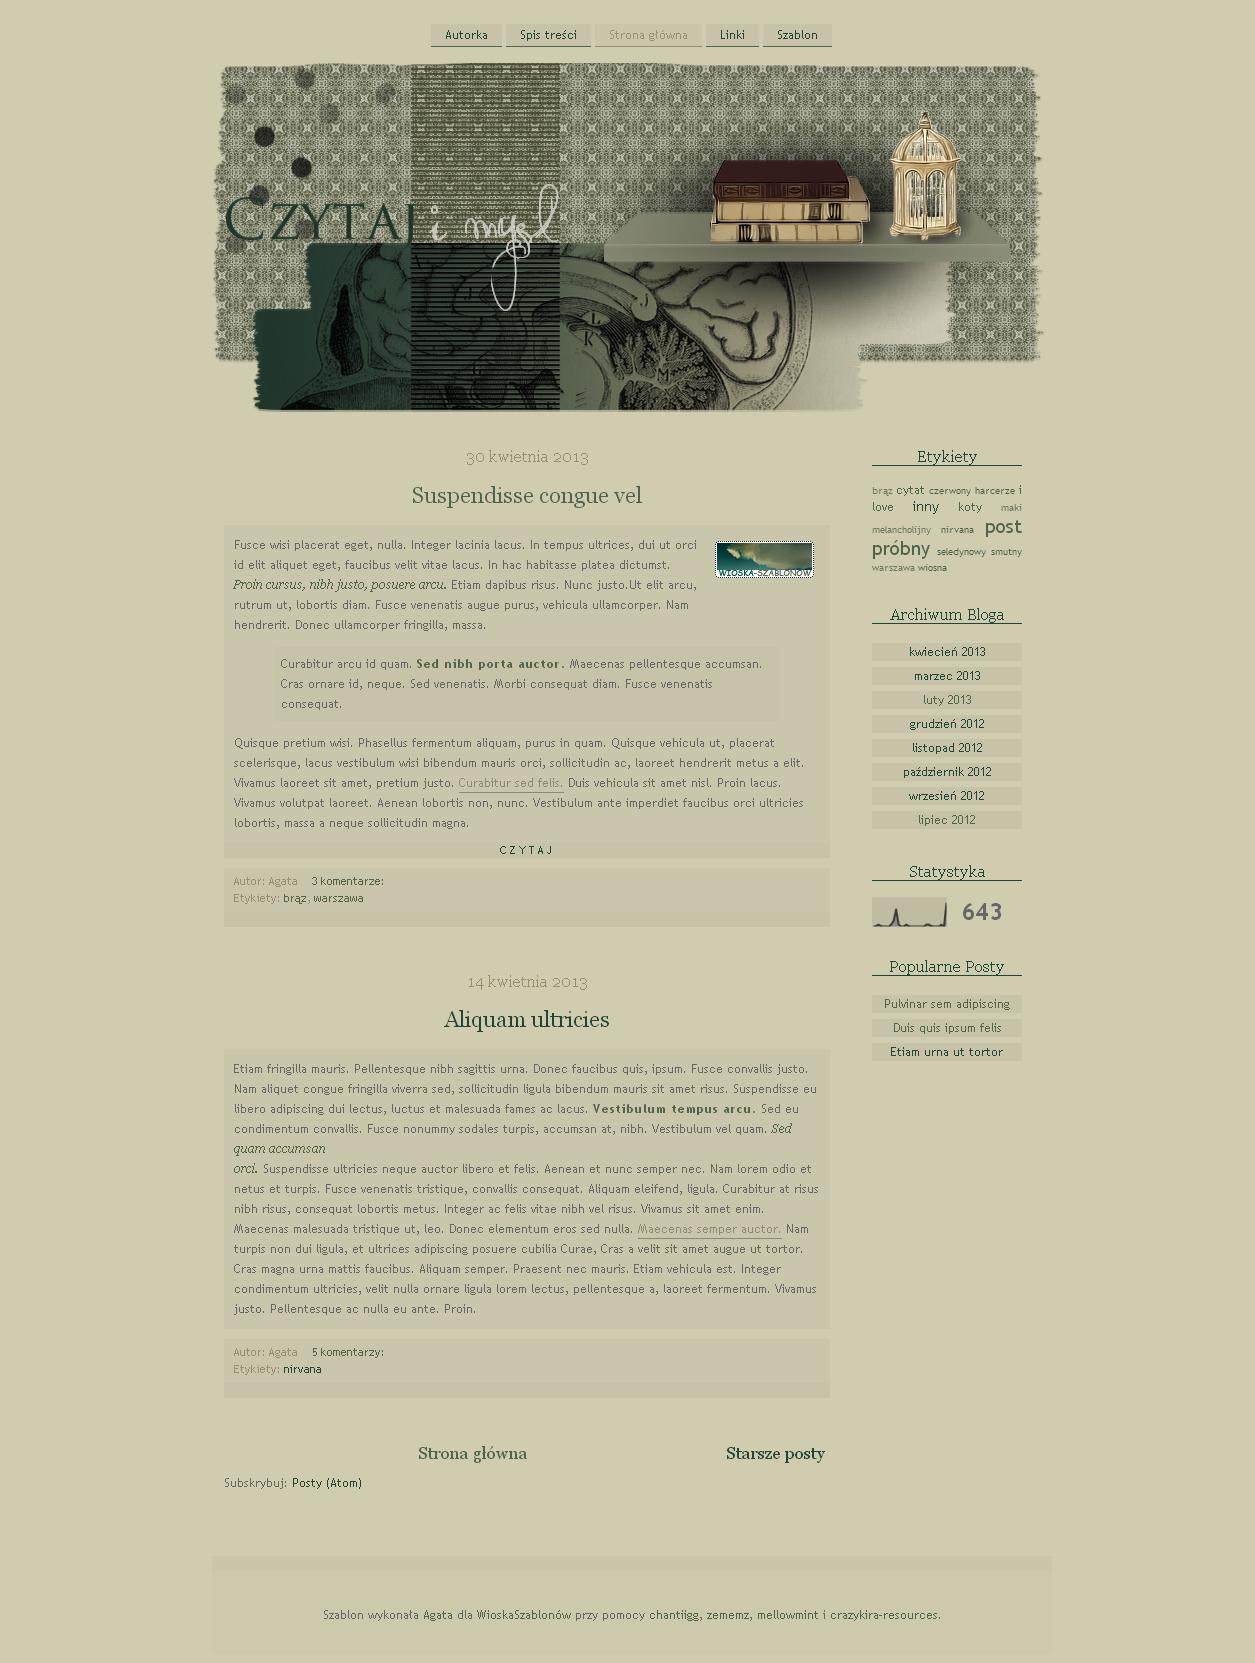 Blogspot template Czytaj i myl v2.0 by stupid-owl